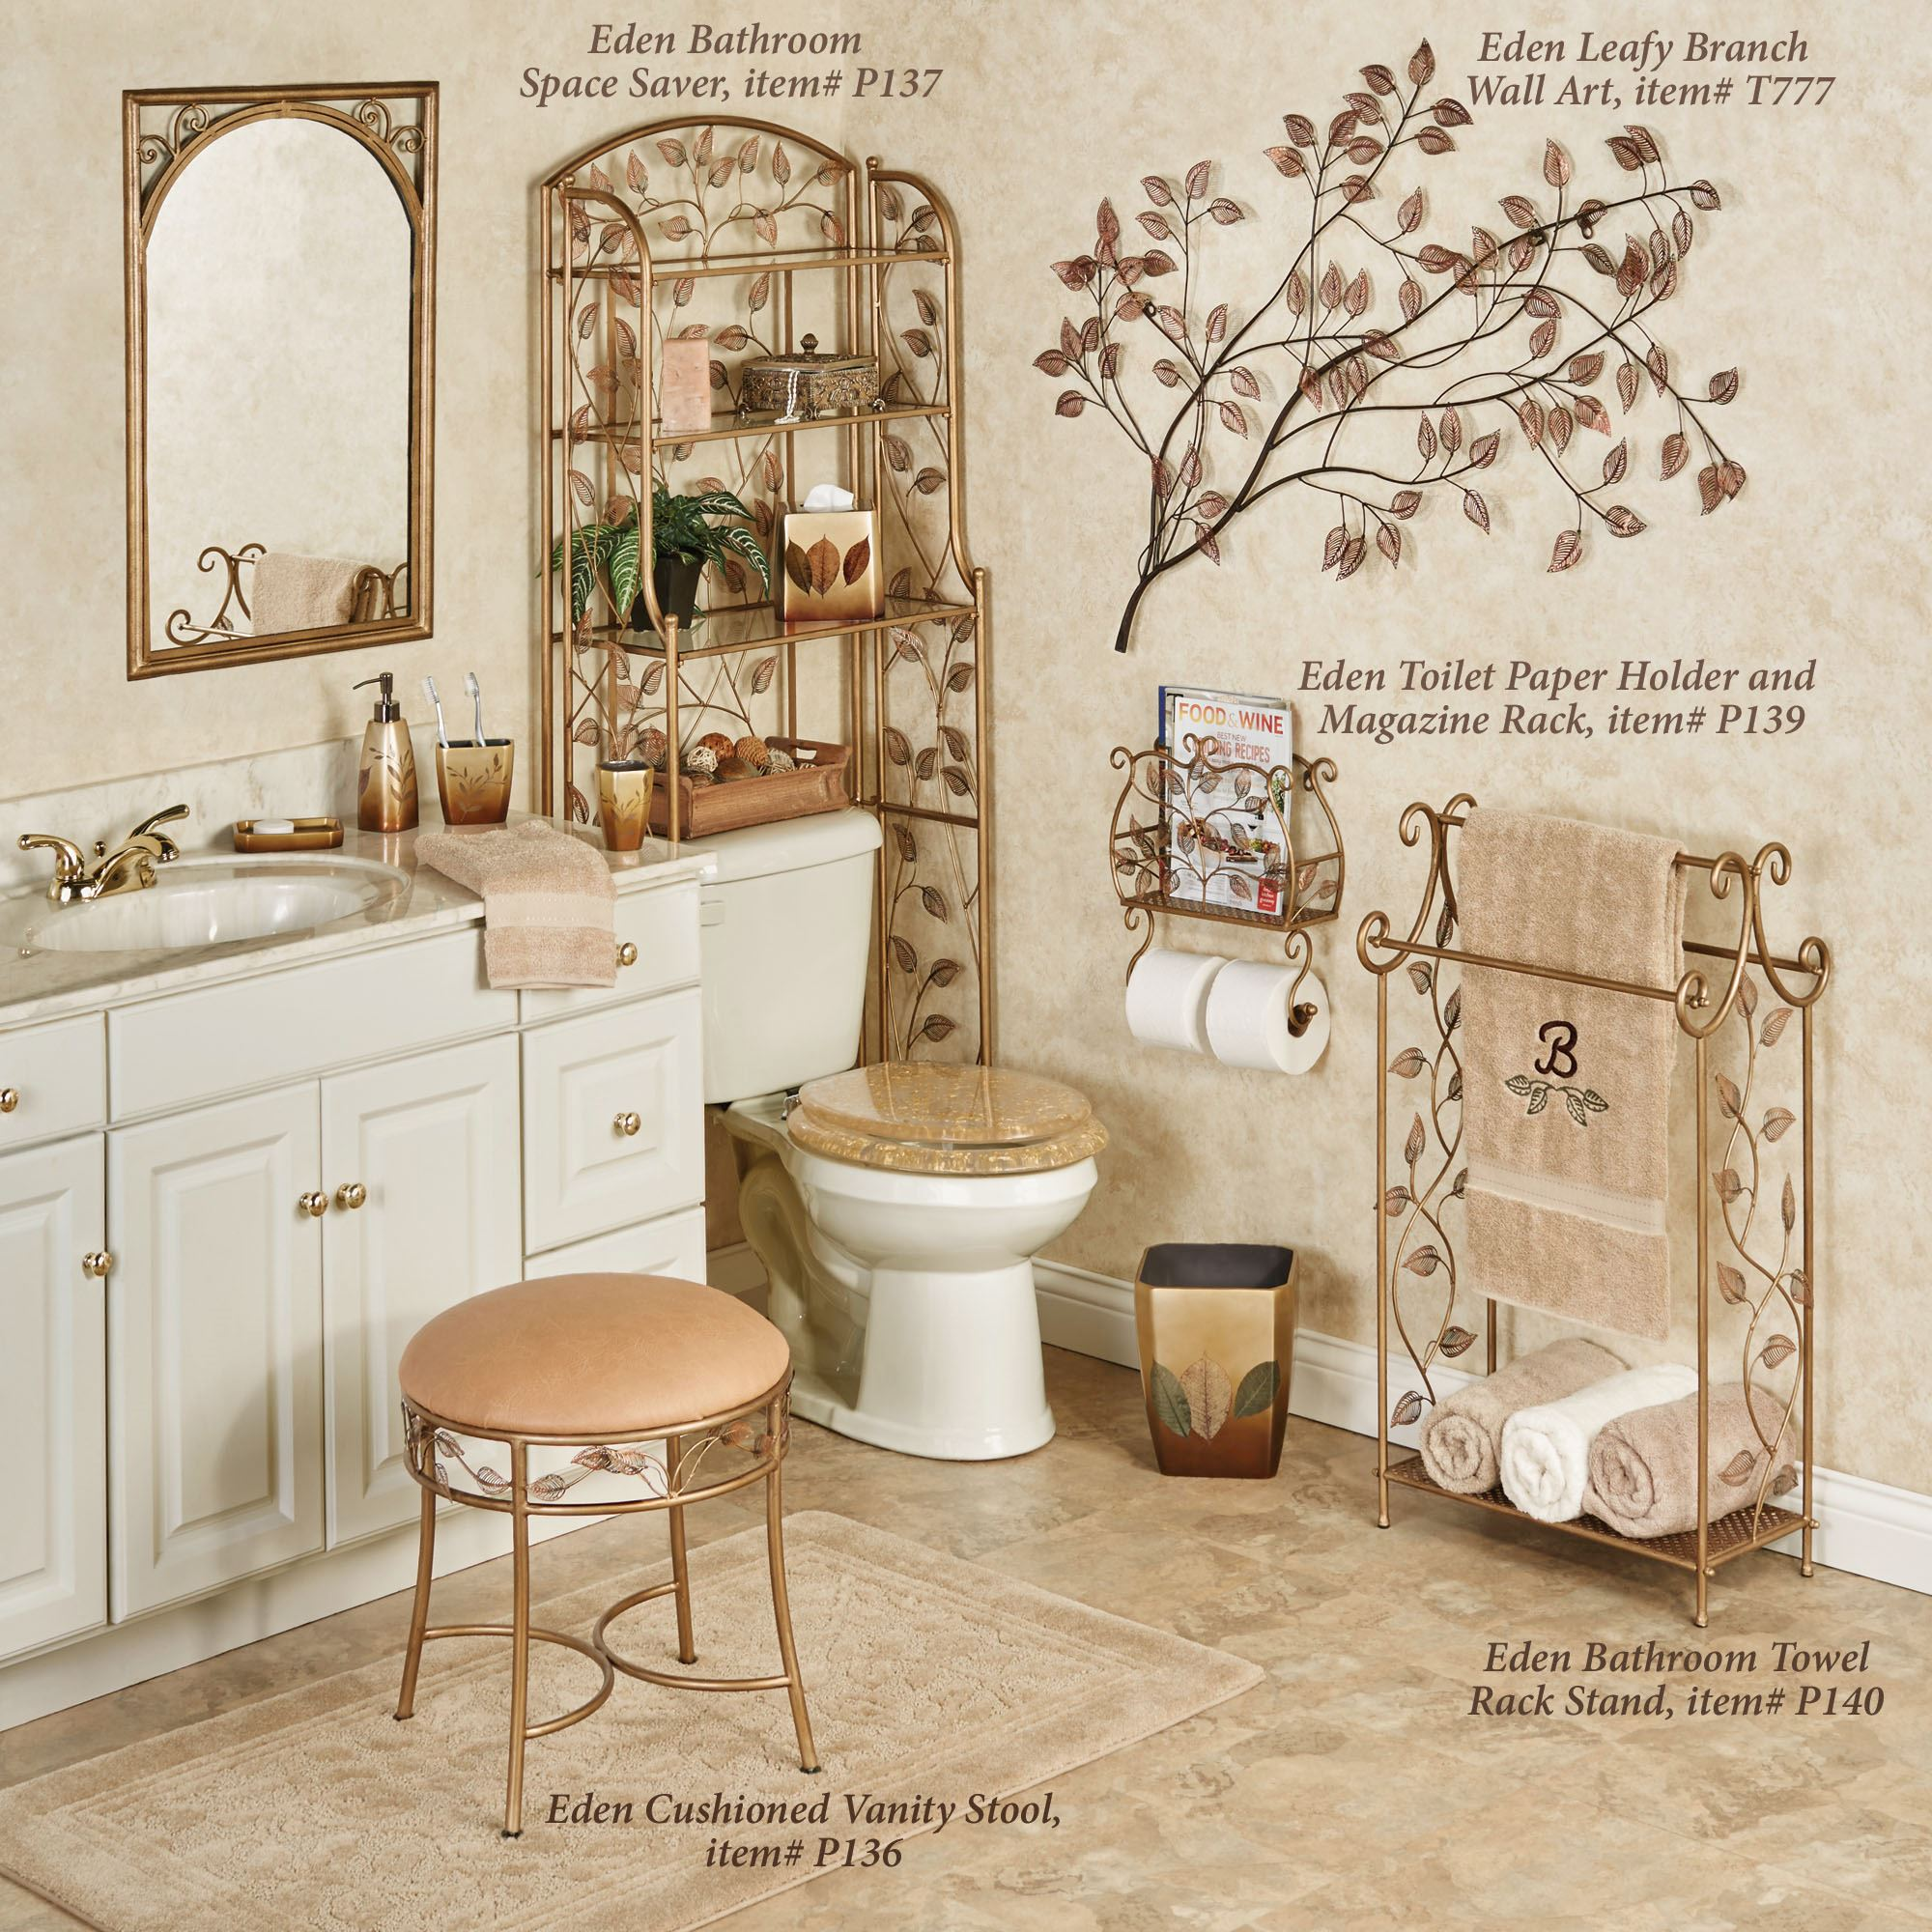 Eden Wall Toilet Paper Holder And Magazine Rack